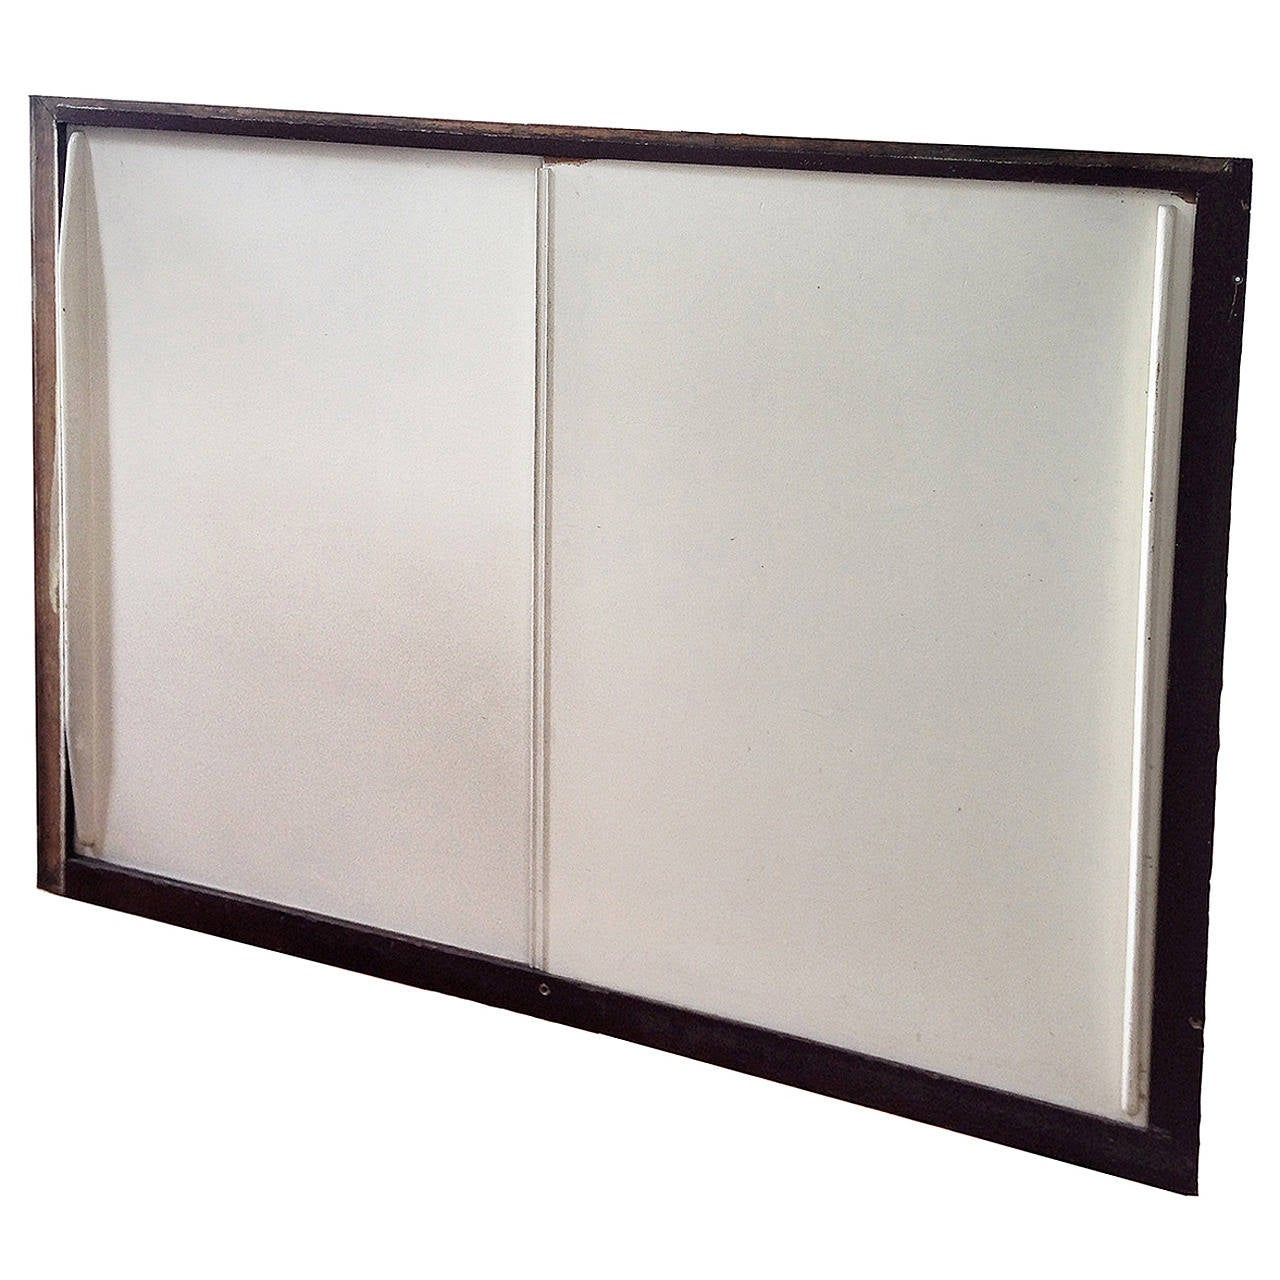 Jean Prouvé Sliding Cabinet Doors in Frames 1